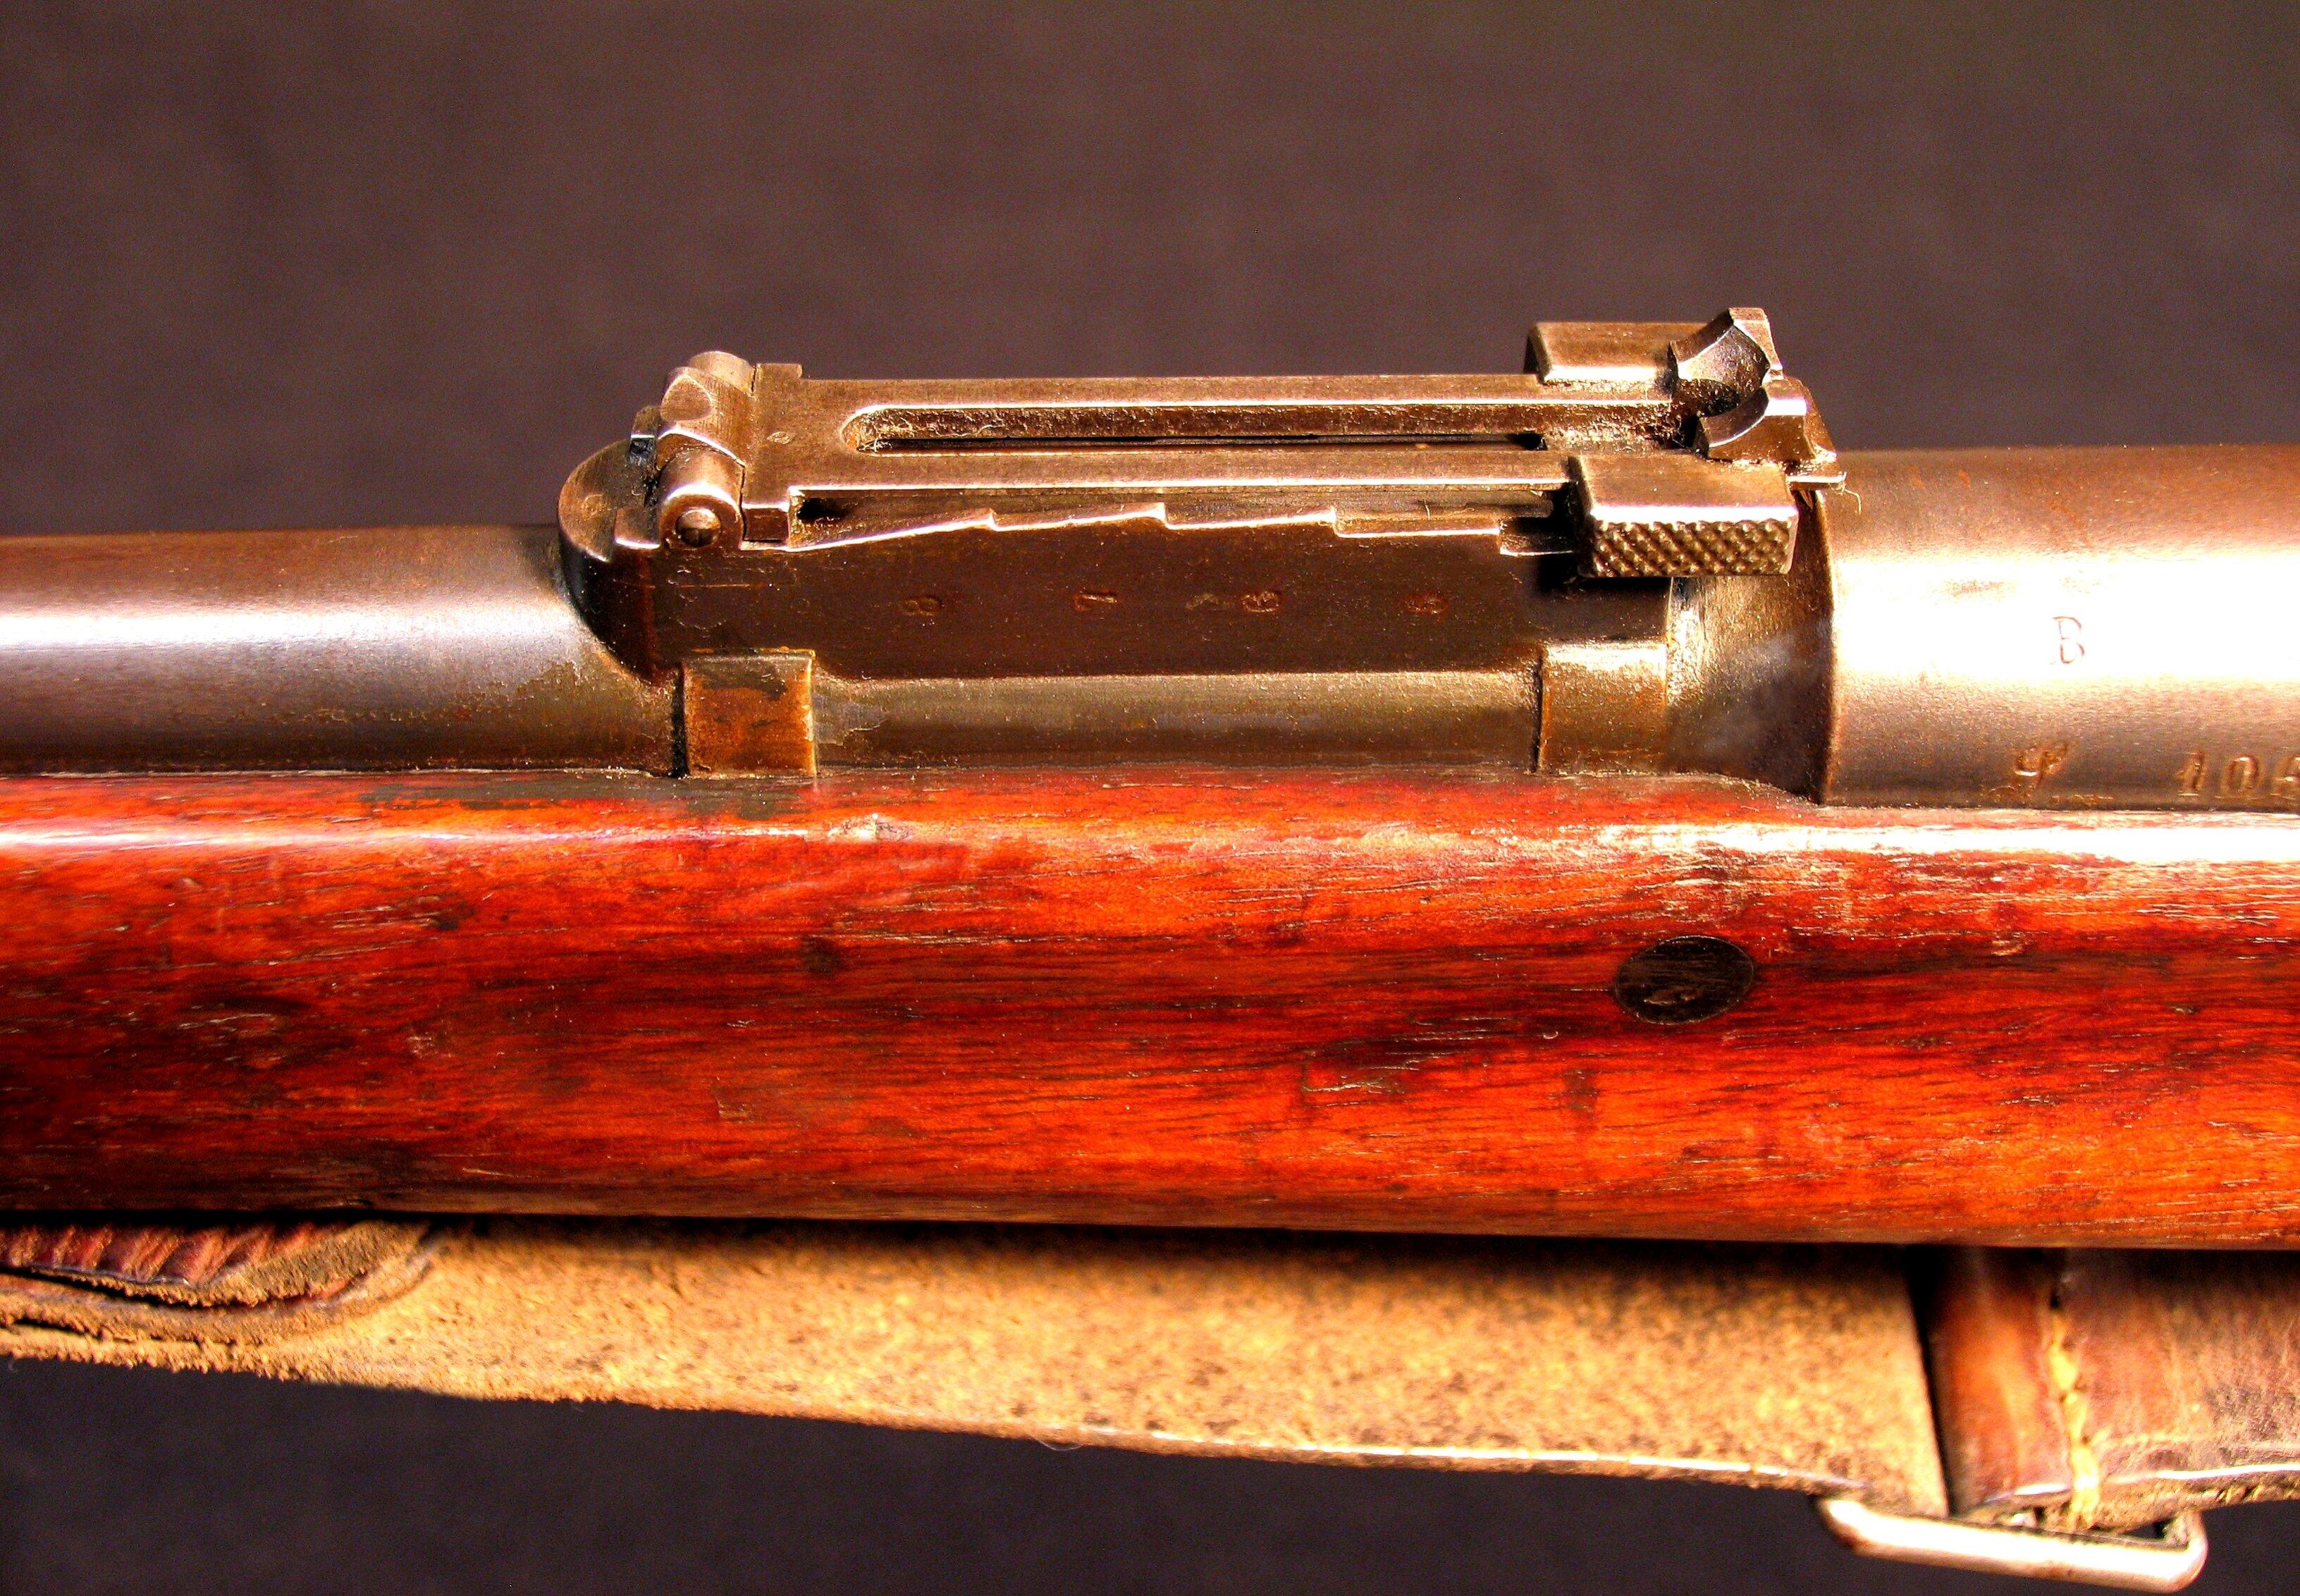 Click image for larger version.  Name:Mle 1886 Lebel Rifle 01B (7).jpg Views:4 Size:1.39 MB ID:3687209